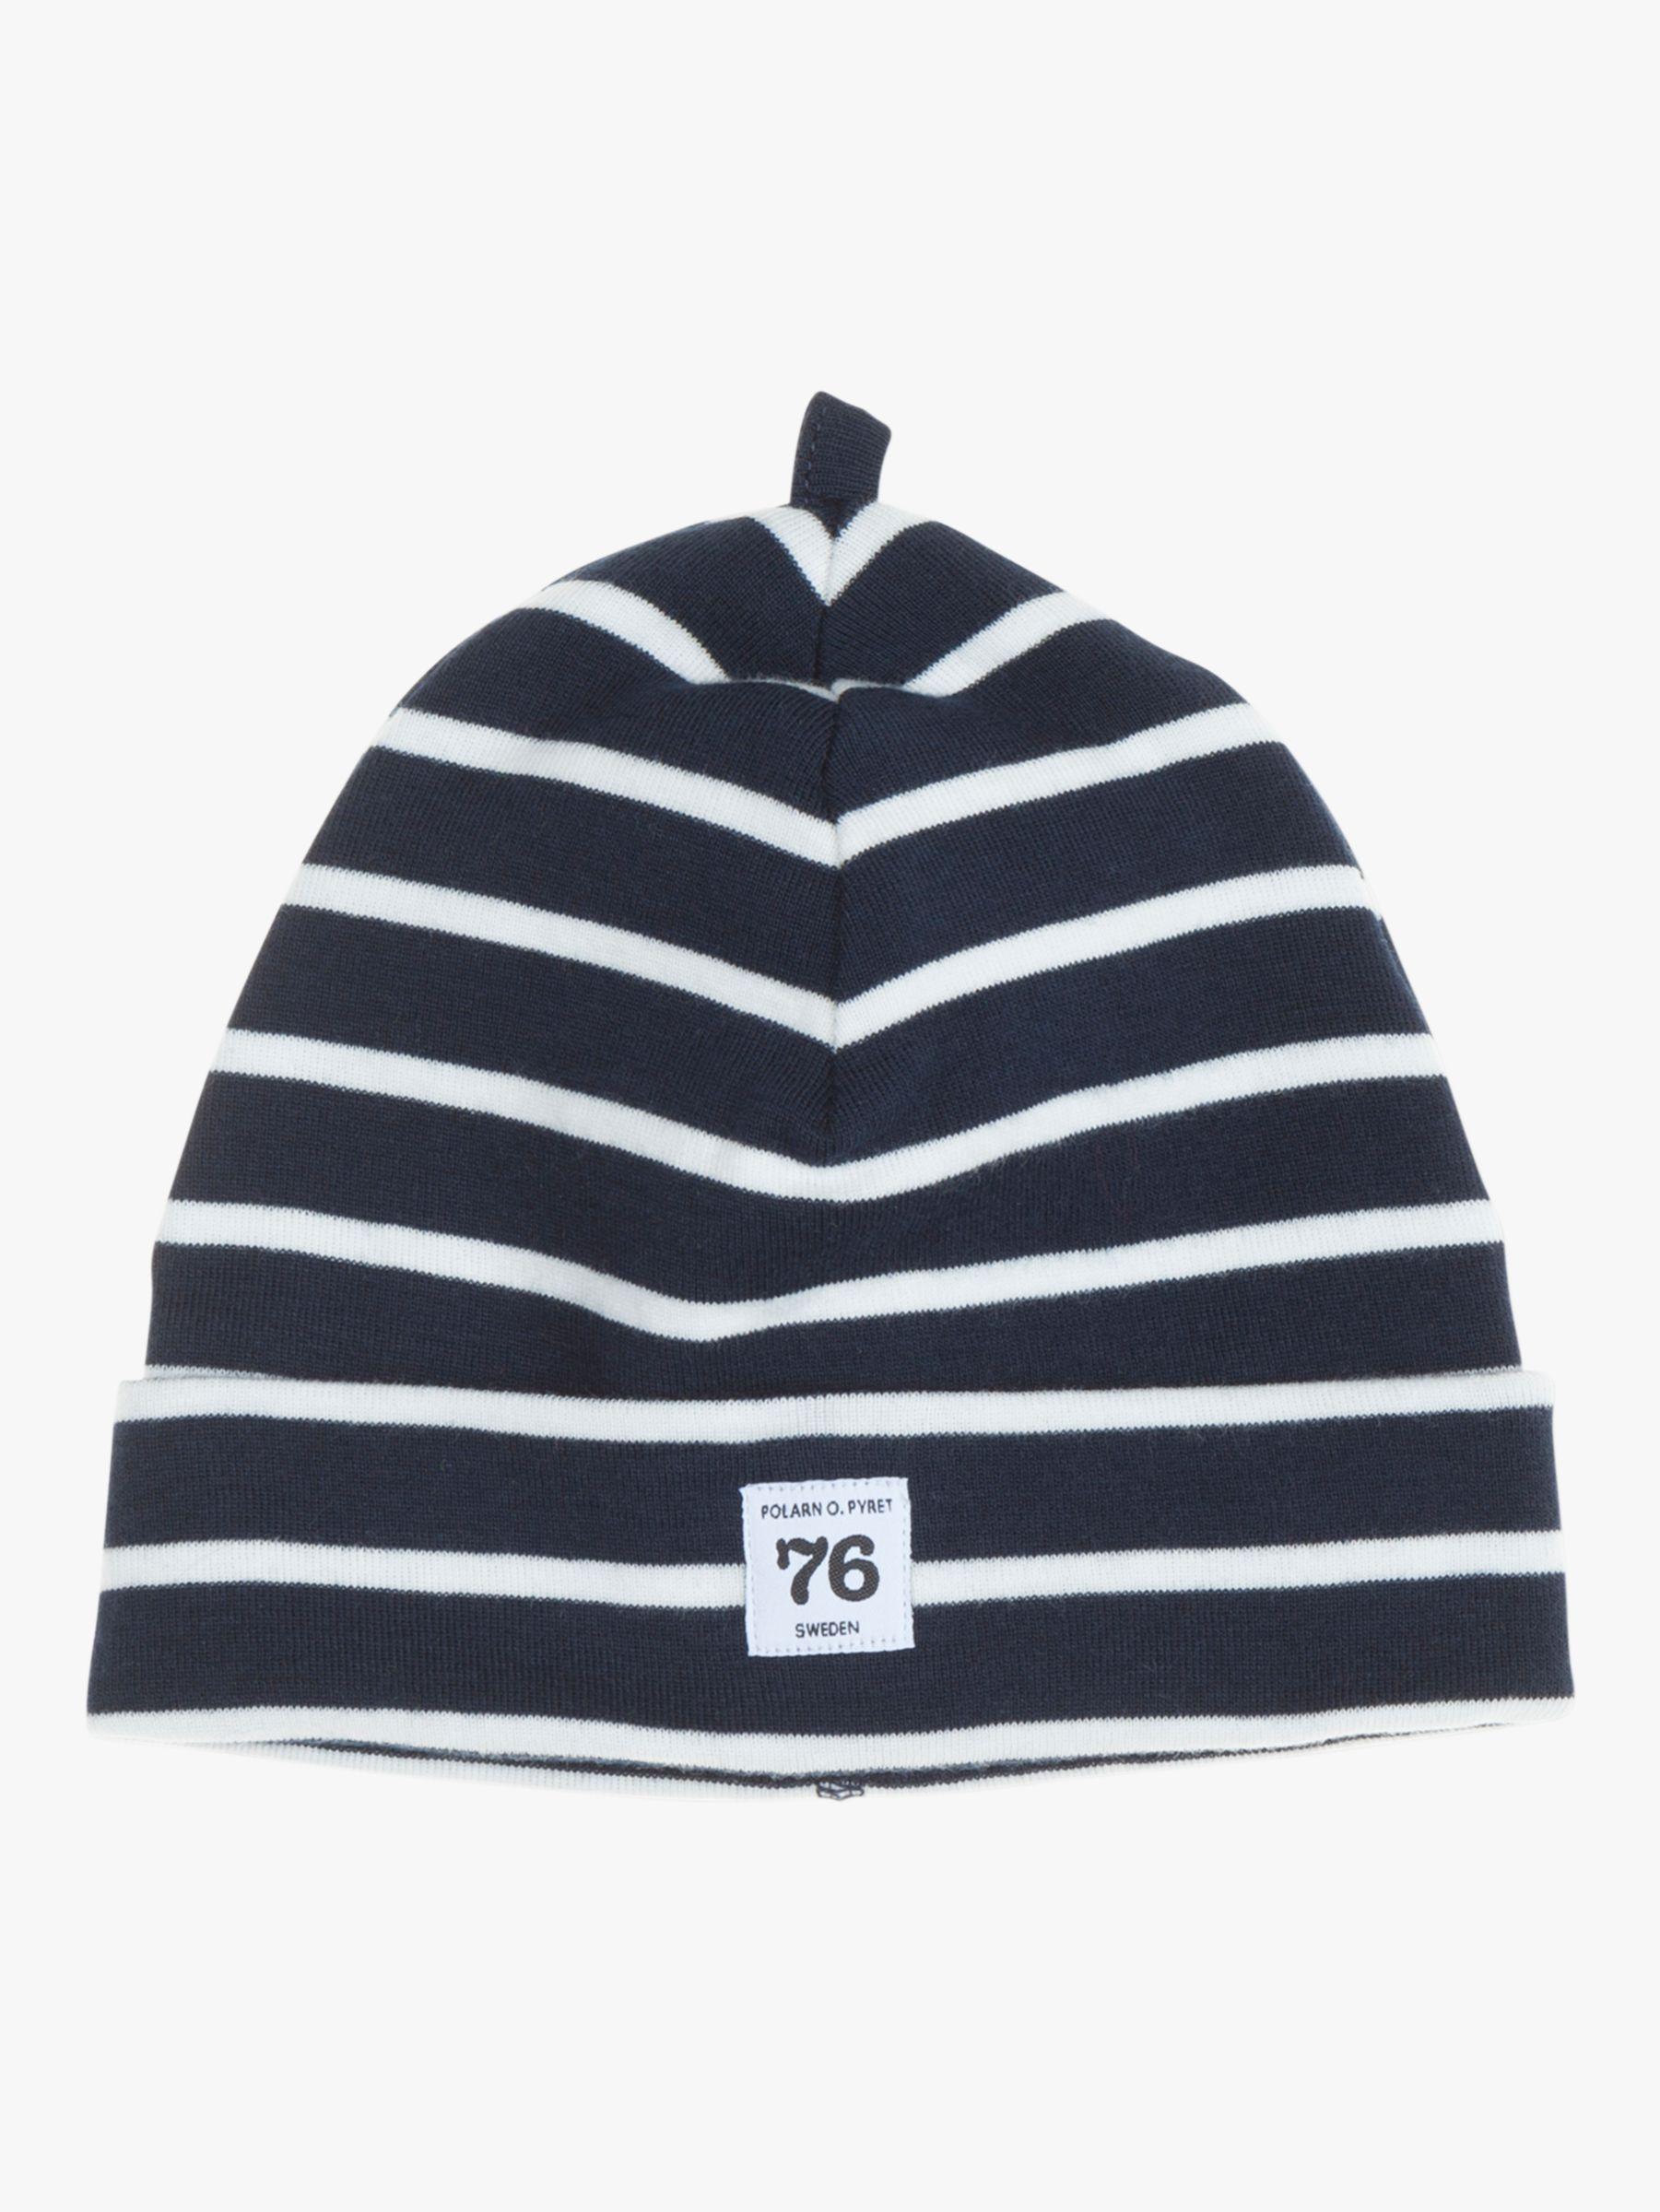 Polarn O. Pyret Polarn O. Pyret Baby GOTS Organic Cotton Stripe Beanie Hat